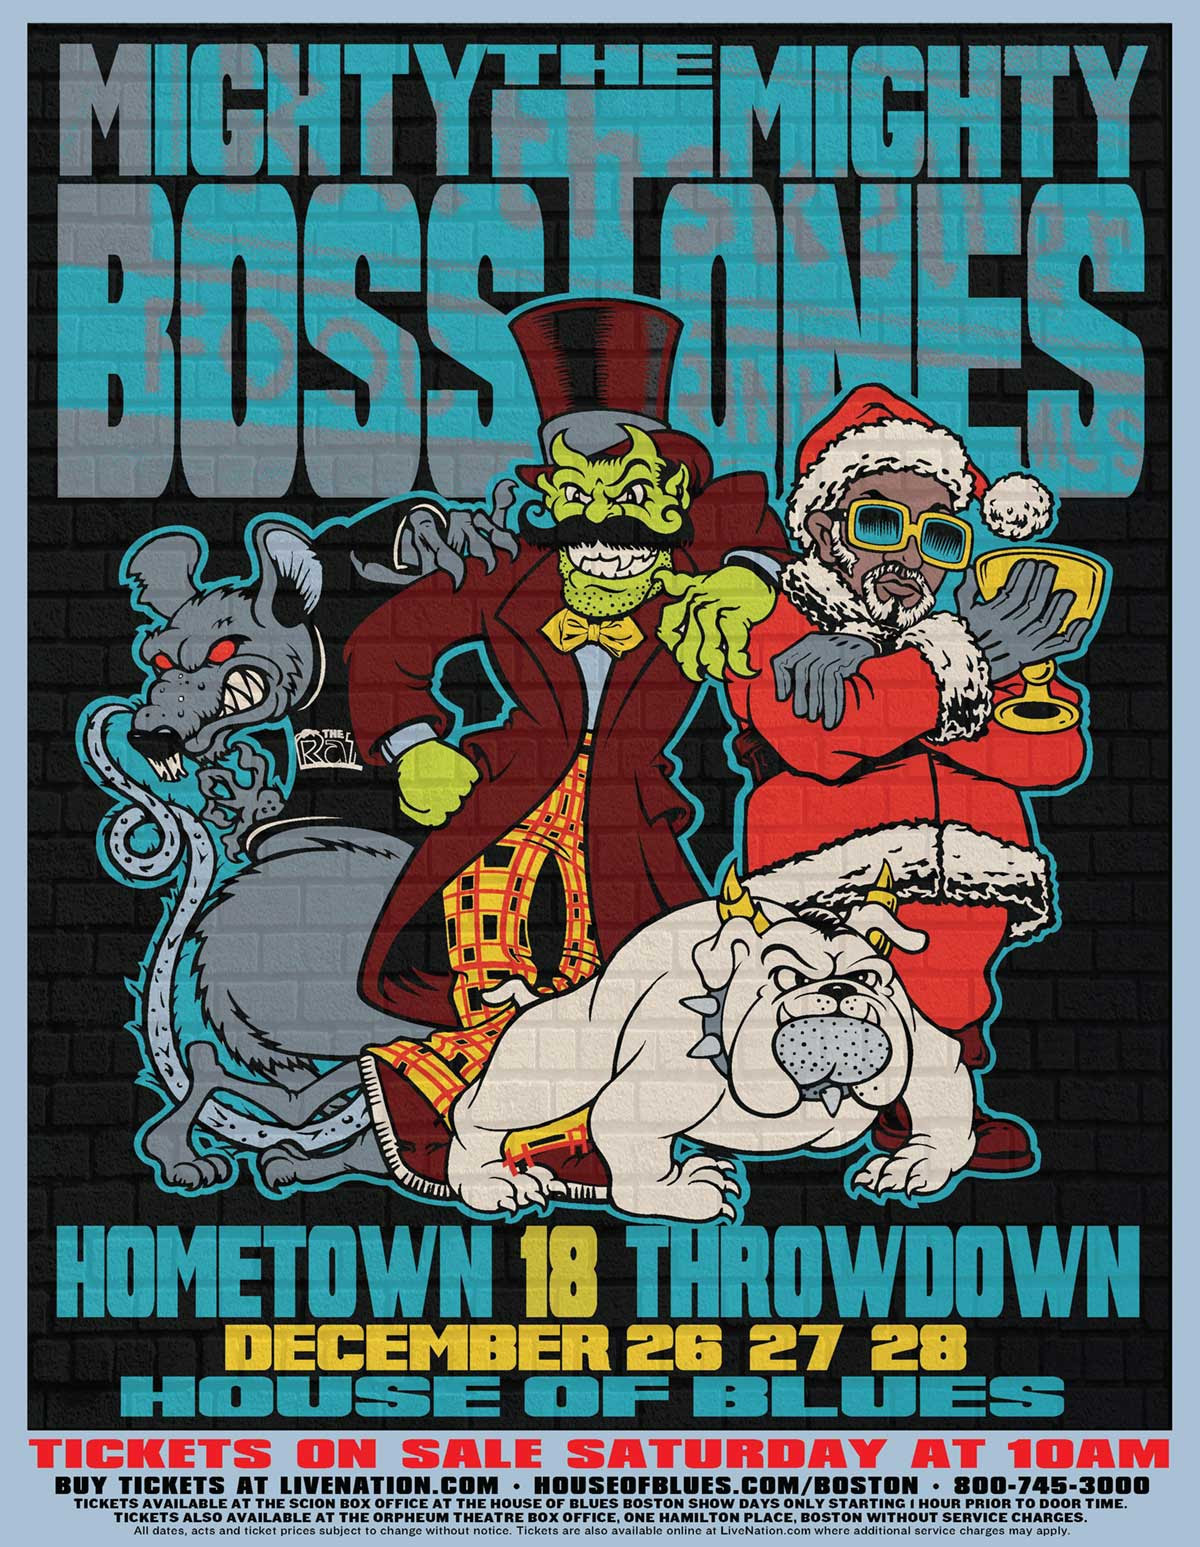 2015 Mighty Mighty Bosstones Hometown Throwdown 18